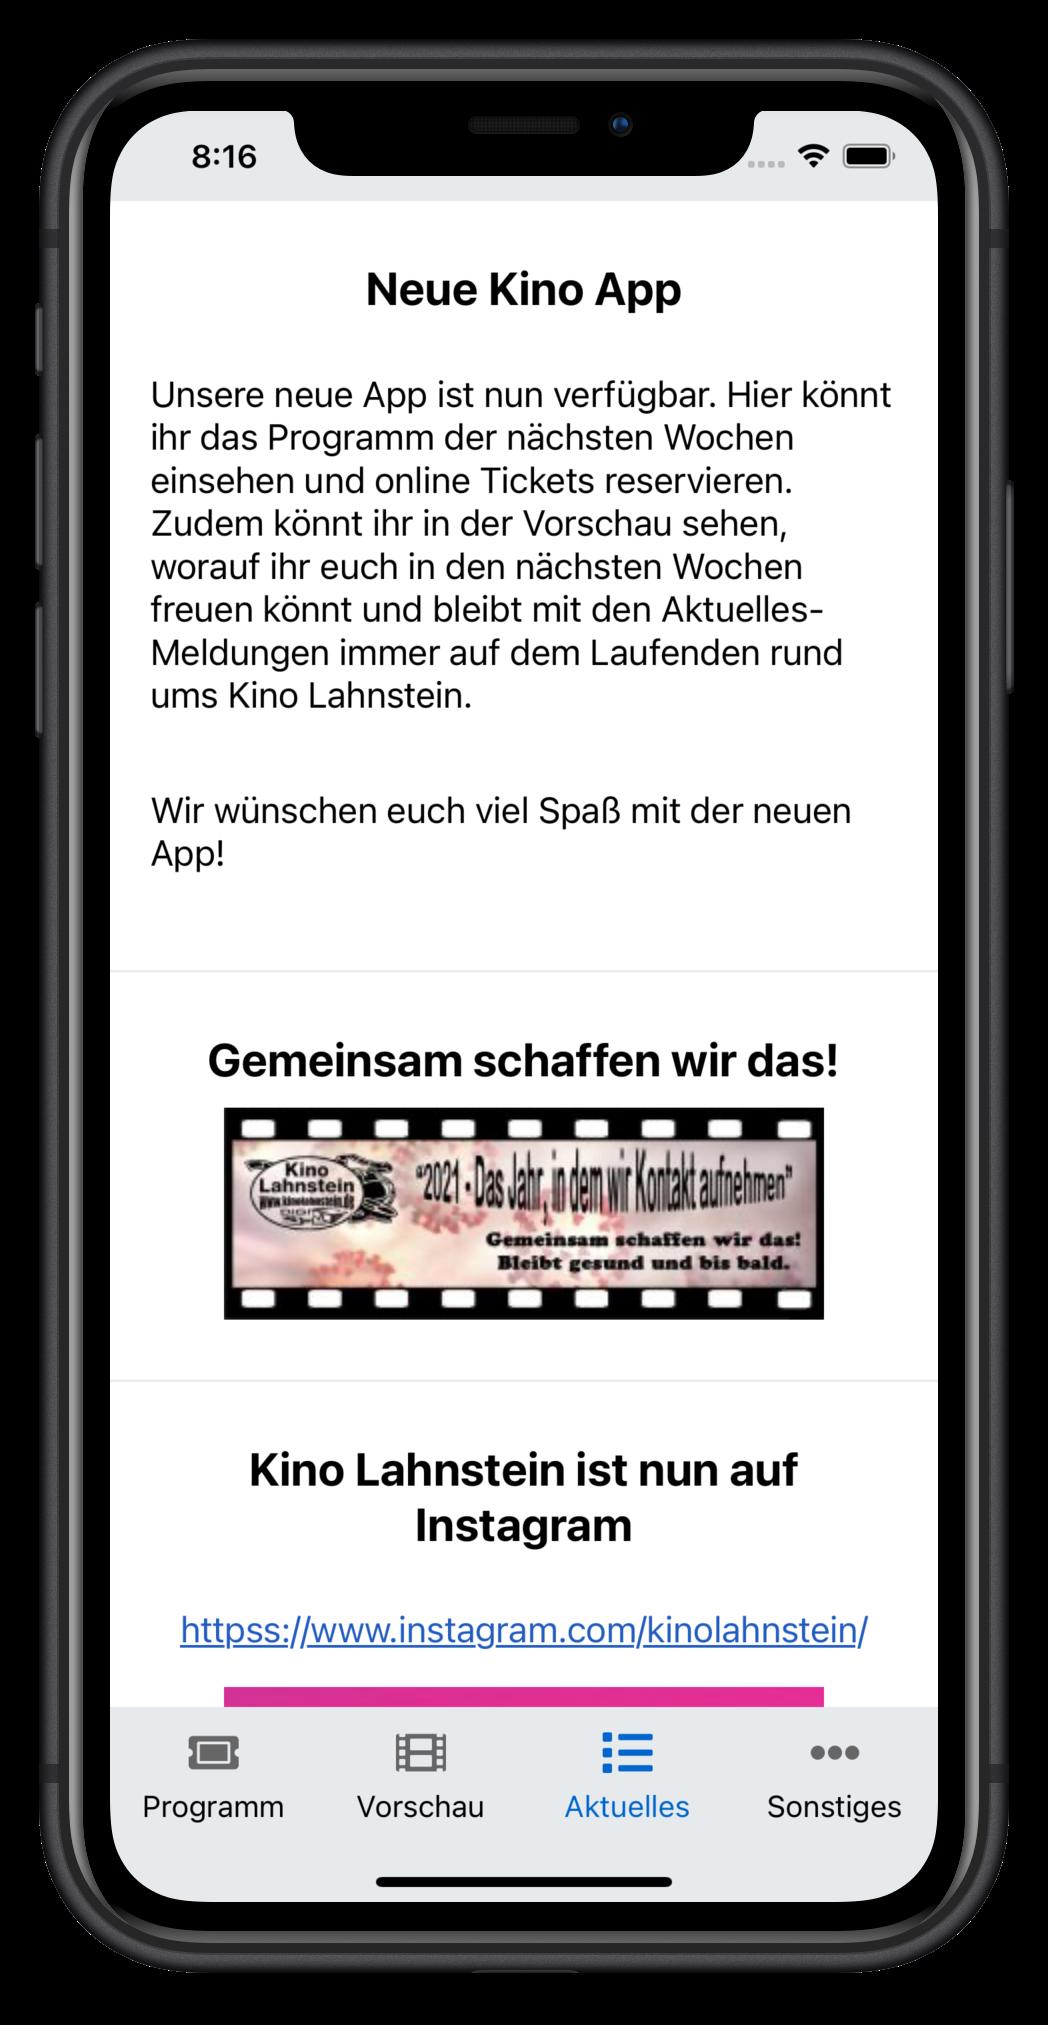 kinolahnstein-app-news-1-light_iphonexrspacegrey_portrait